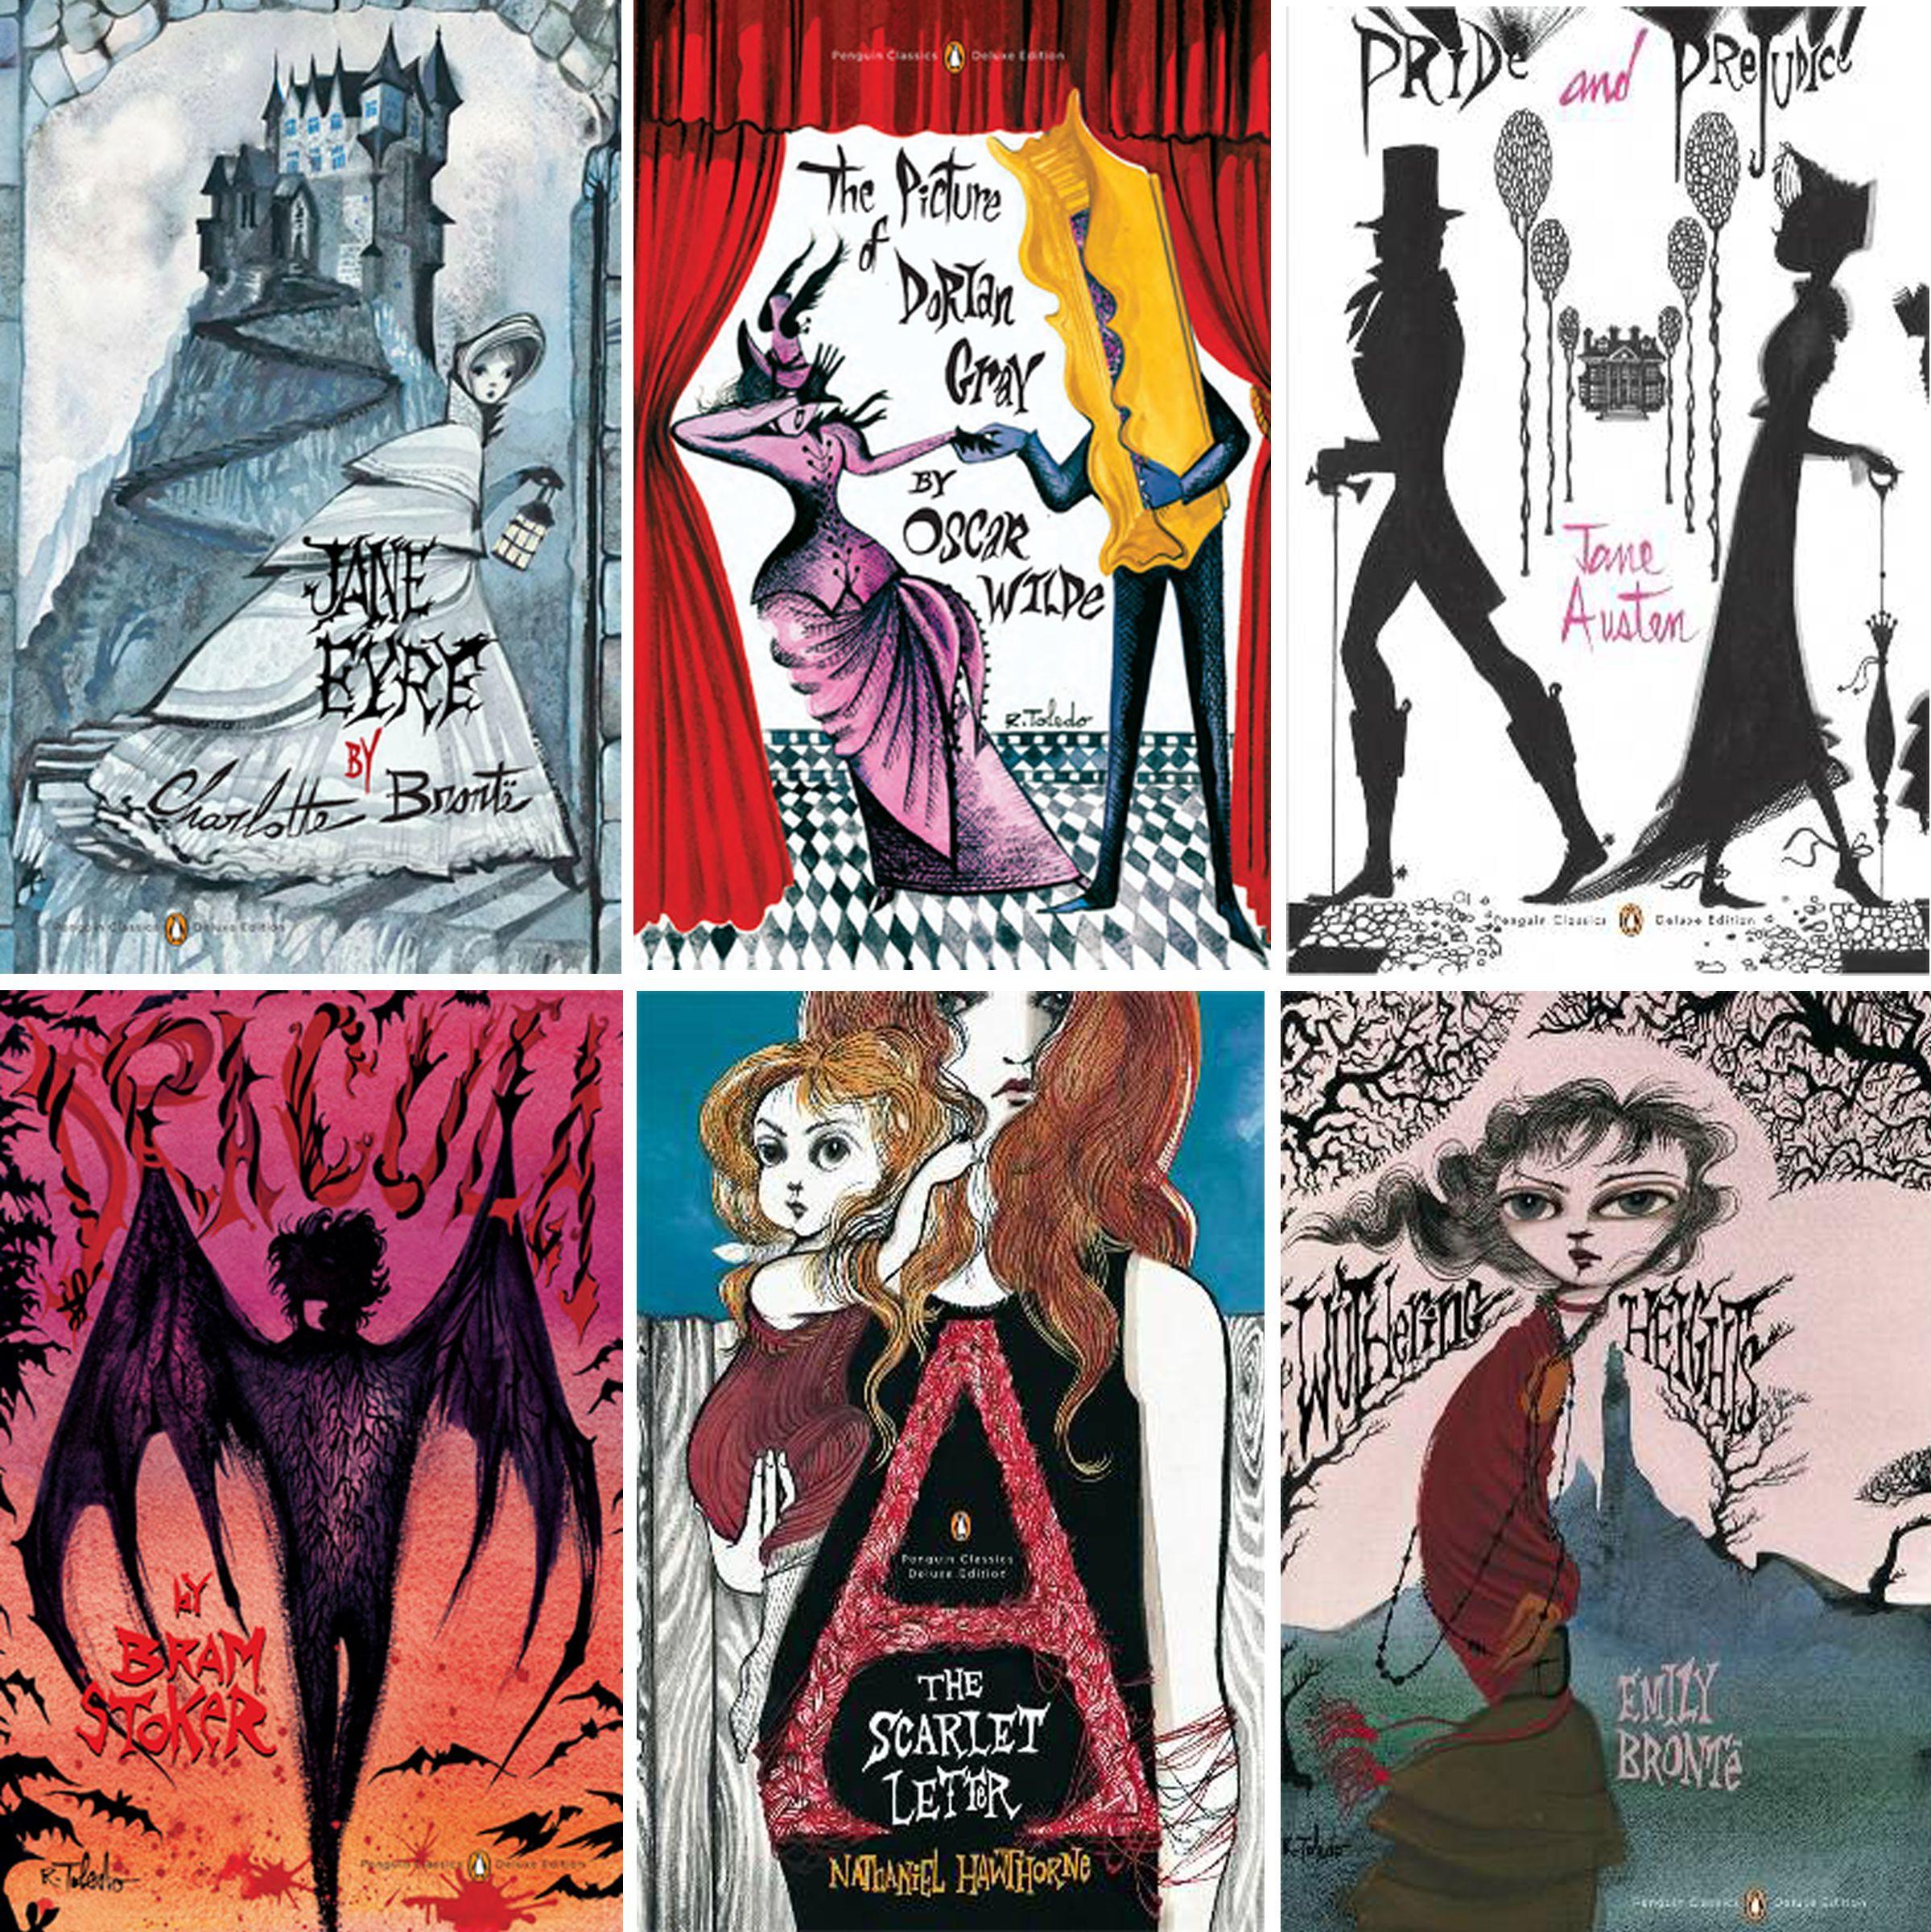 Classic Book Cover Art : Penguin classics ruben toledo book covers beautiful art